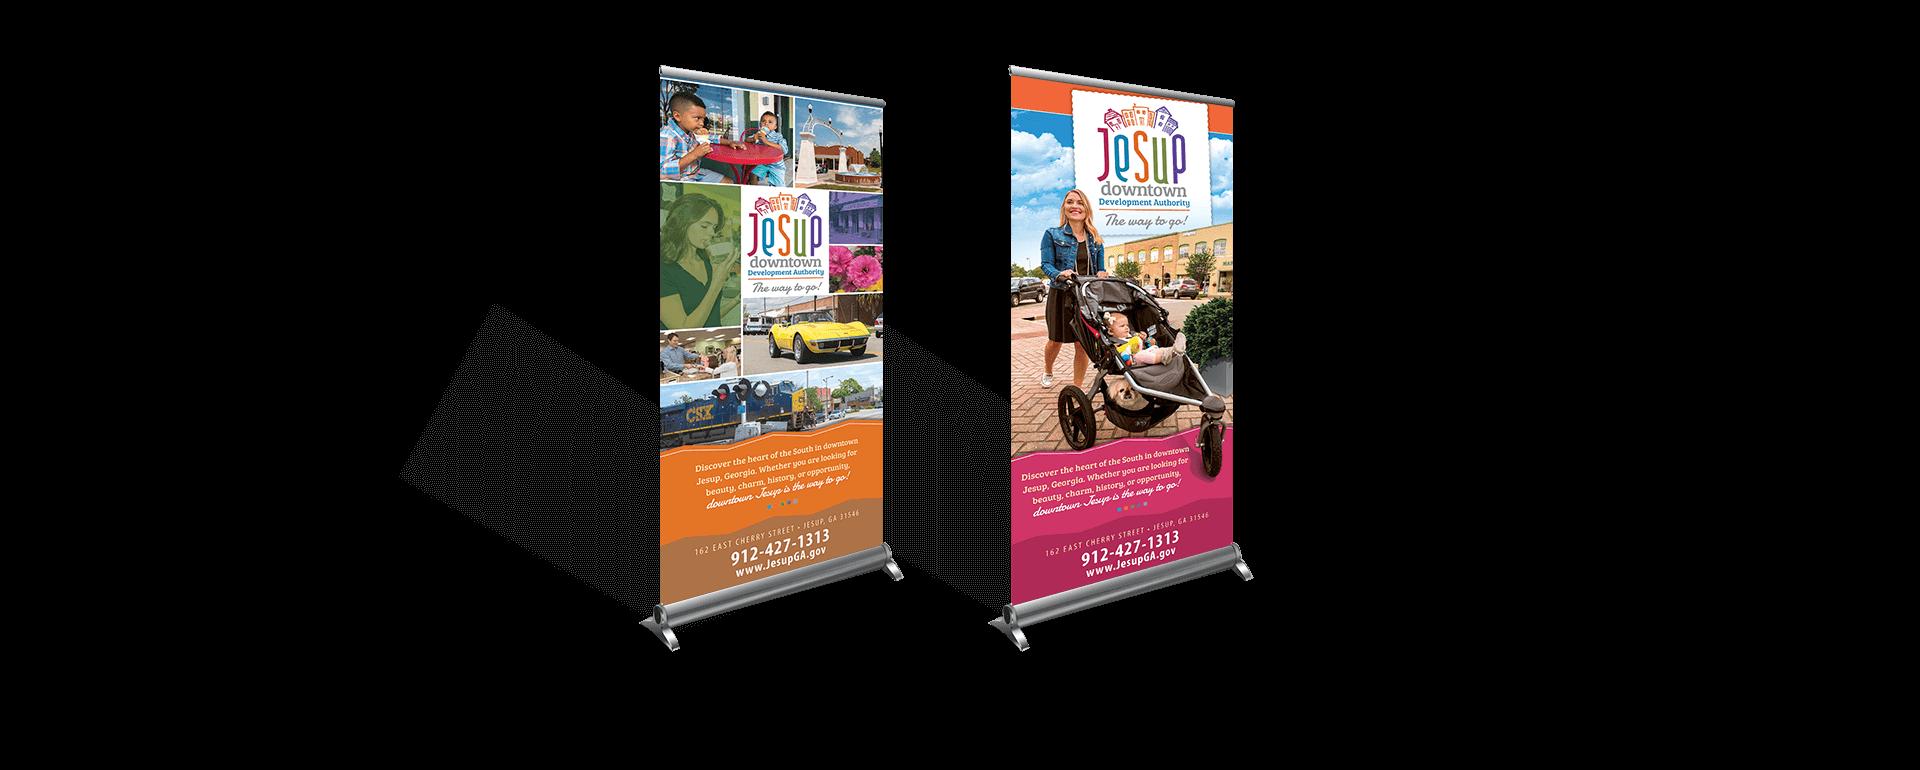 City Of Jesup Branding Development 365 Degree Total Marketing